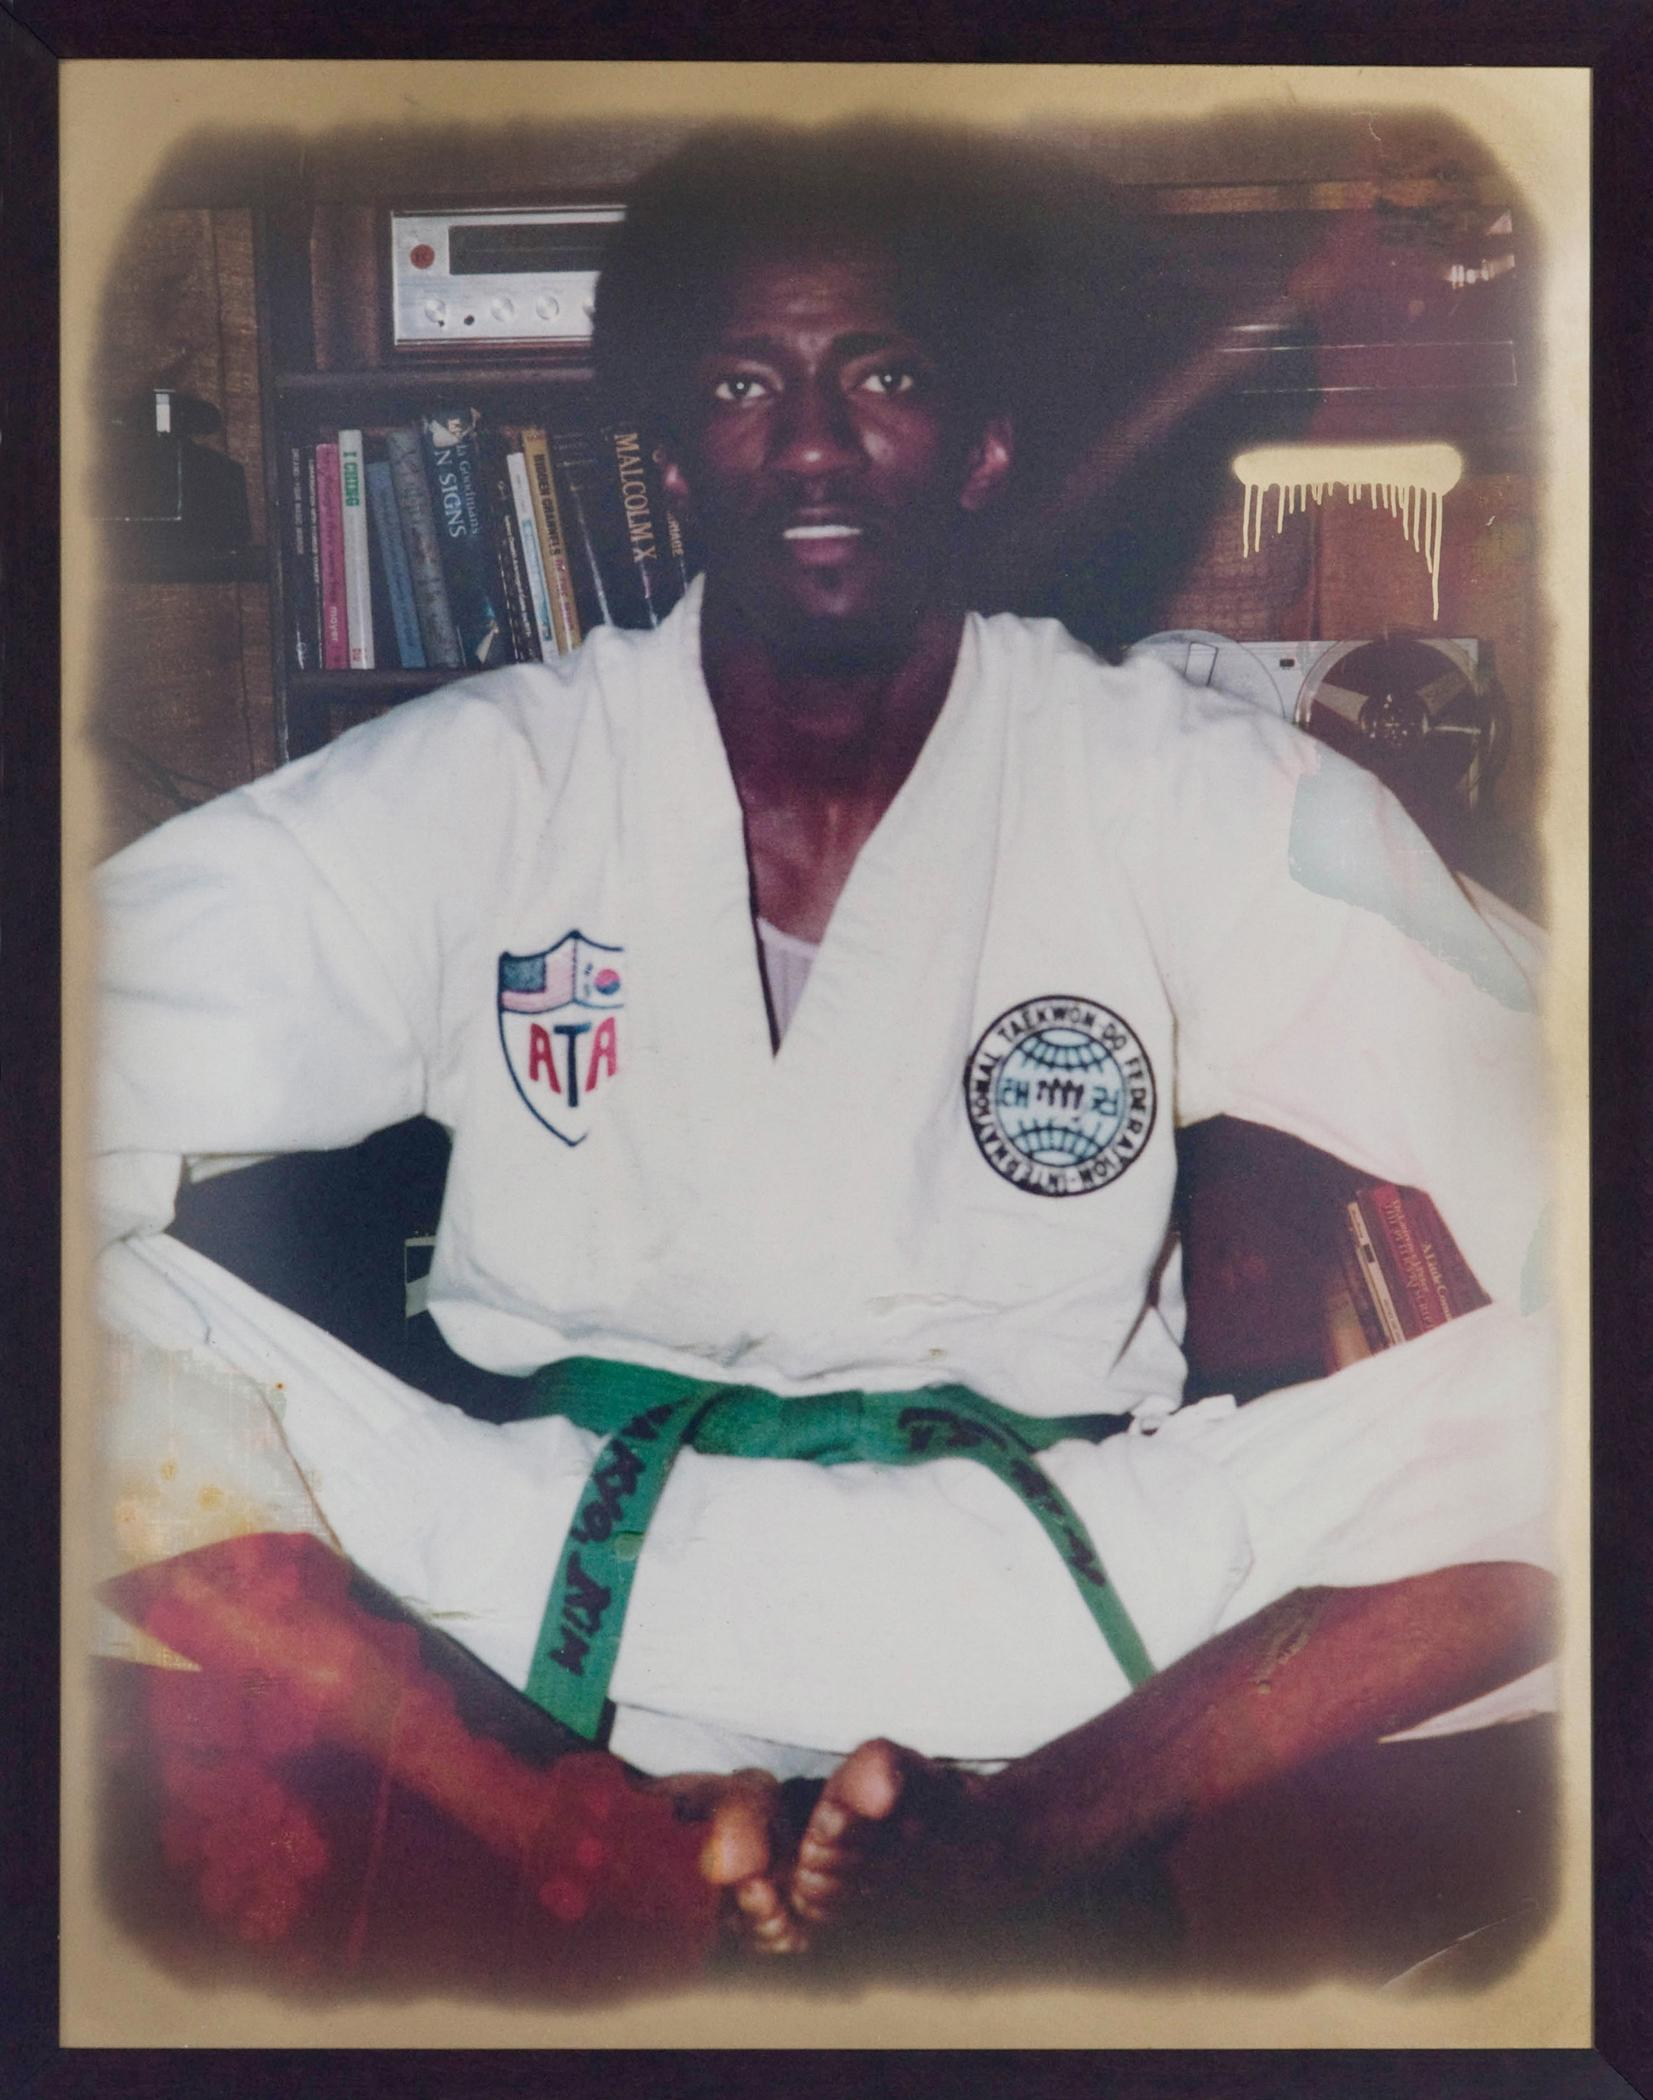 A dark-skinned person wearing a Taekwondo uniform sits on the ground.